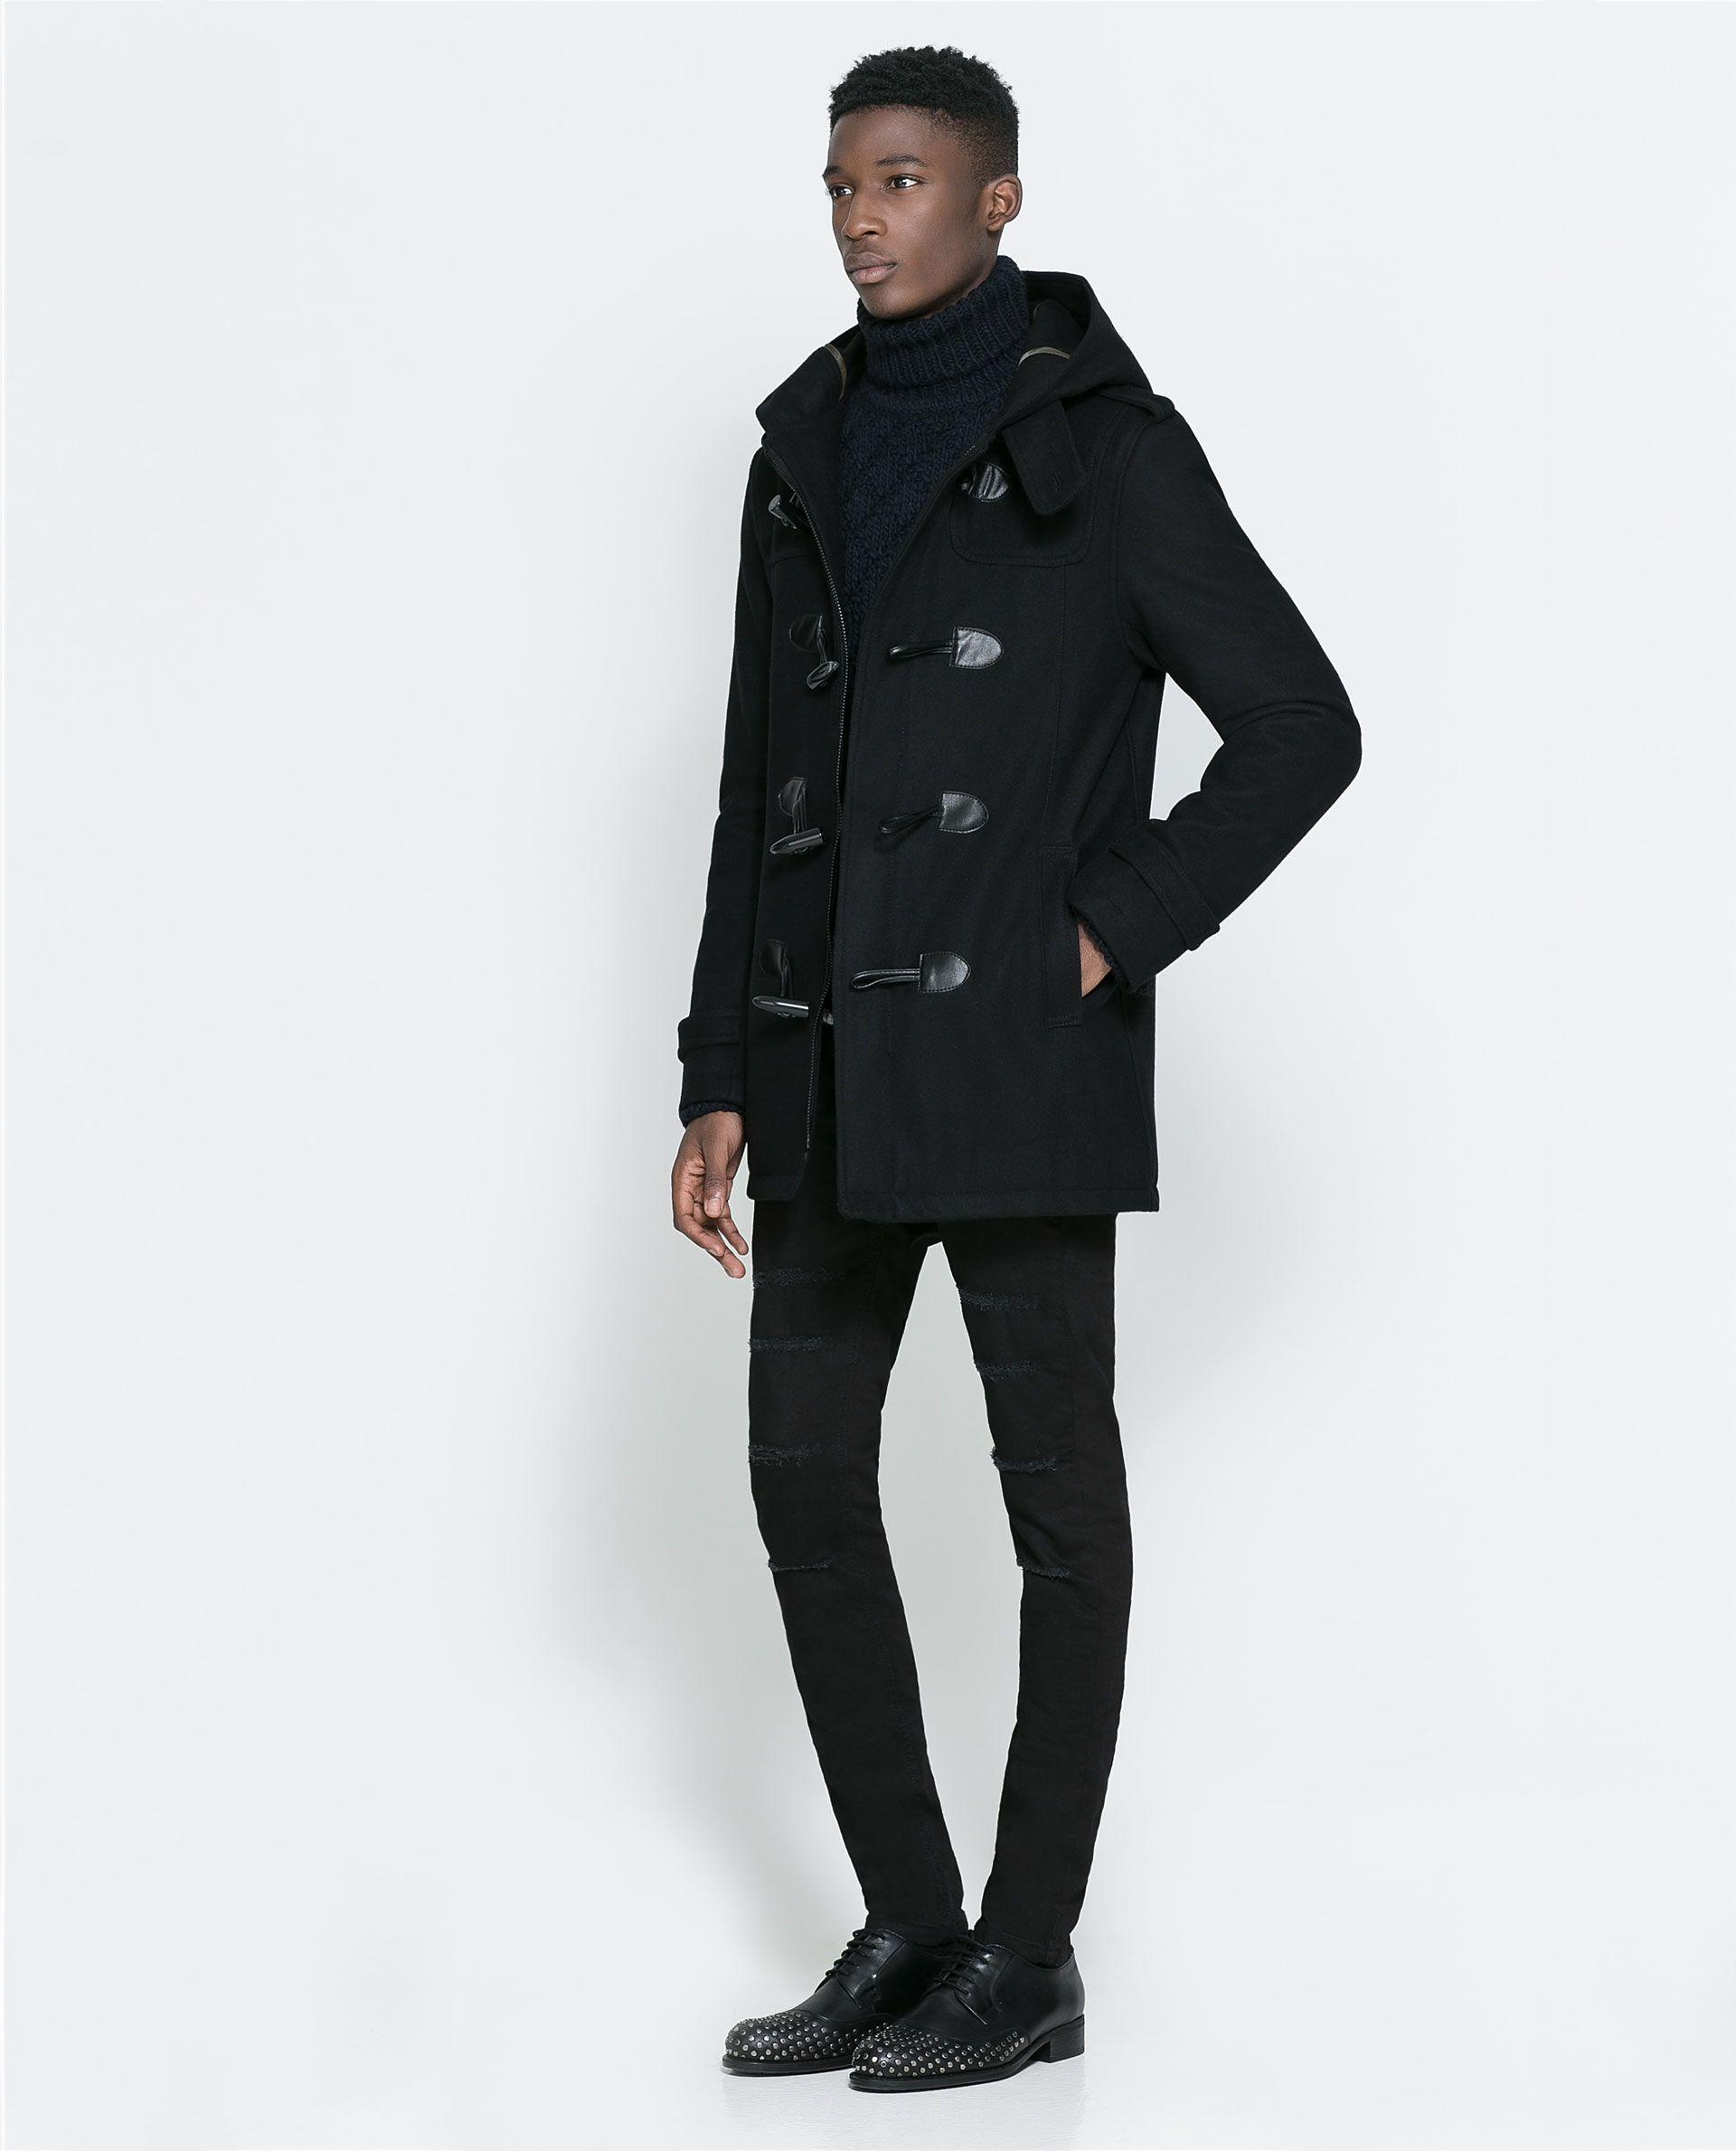 Zara BASIC BLACK DUFFLE COAT Ref. 6593/362 179.00 CAD OUTER SHELL ...